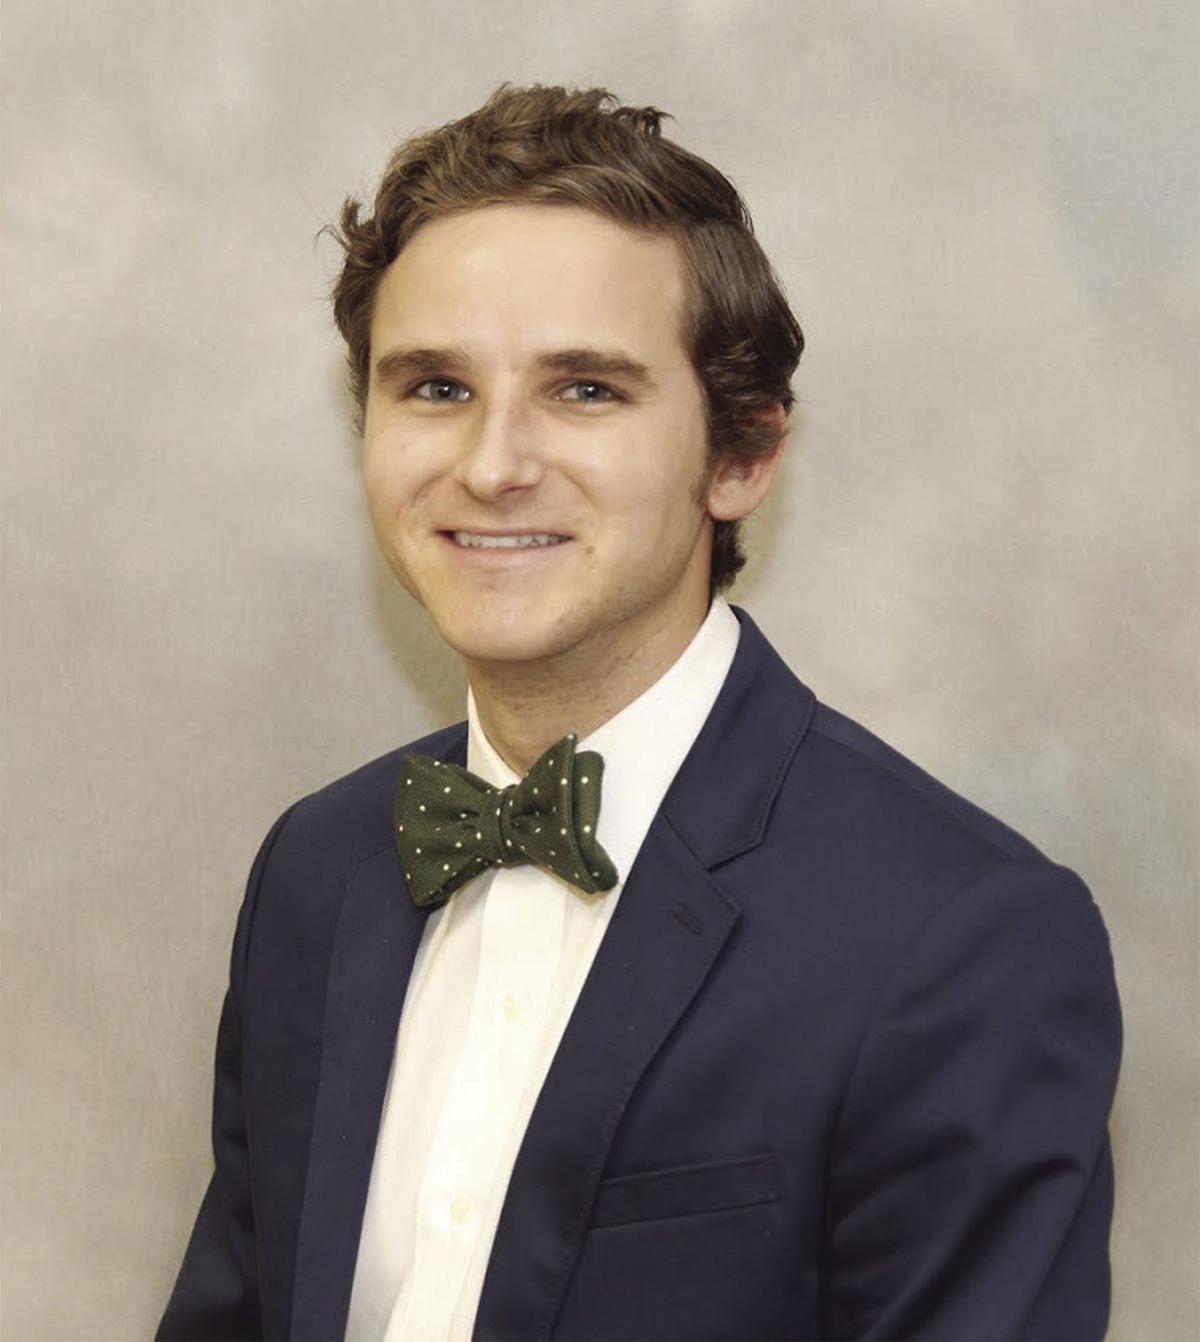 Southeastern Louisiana University student chosen as Governor's Fellow